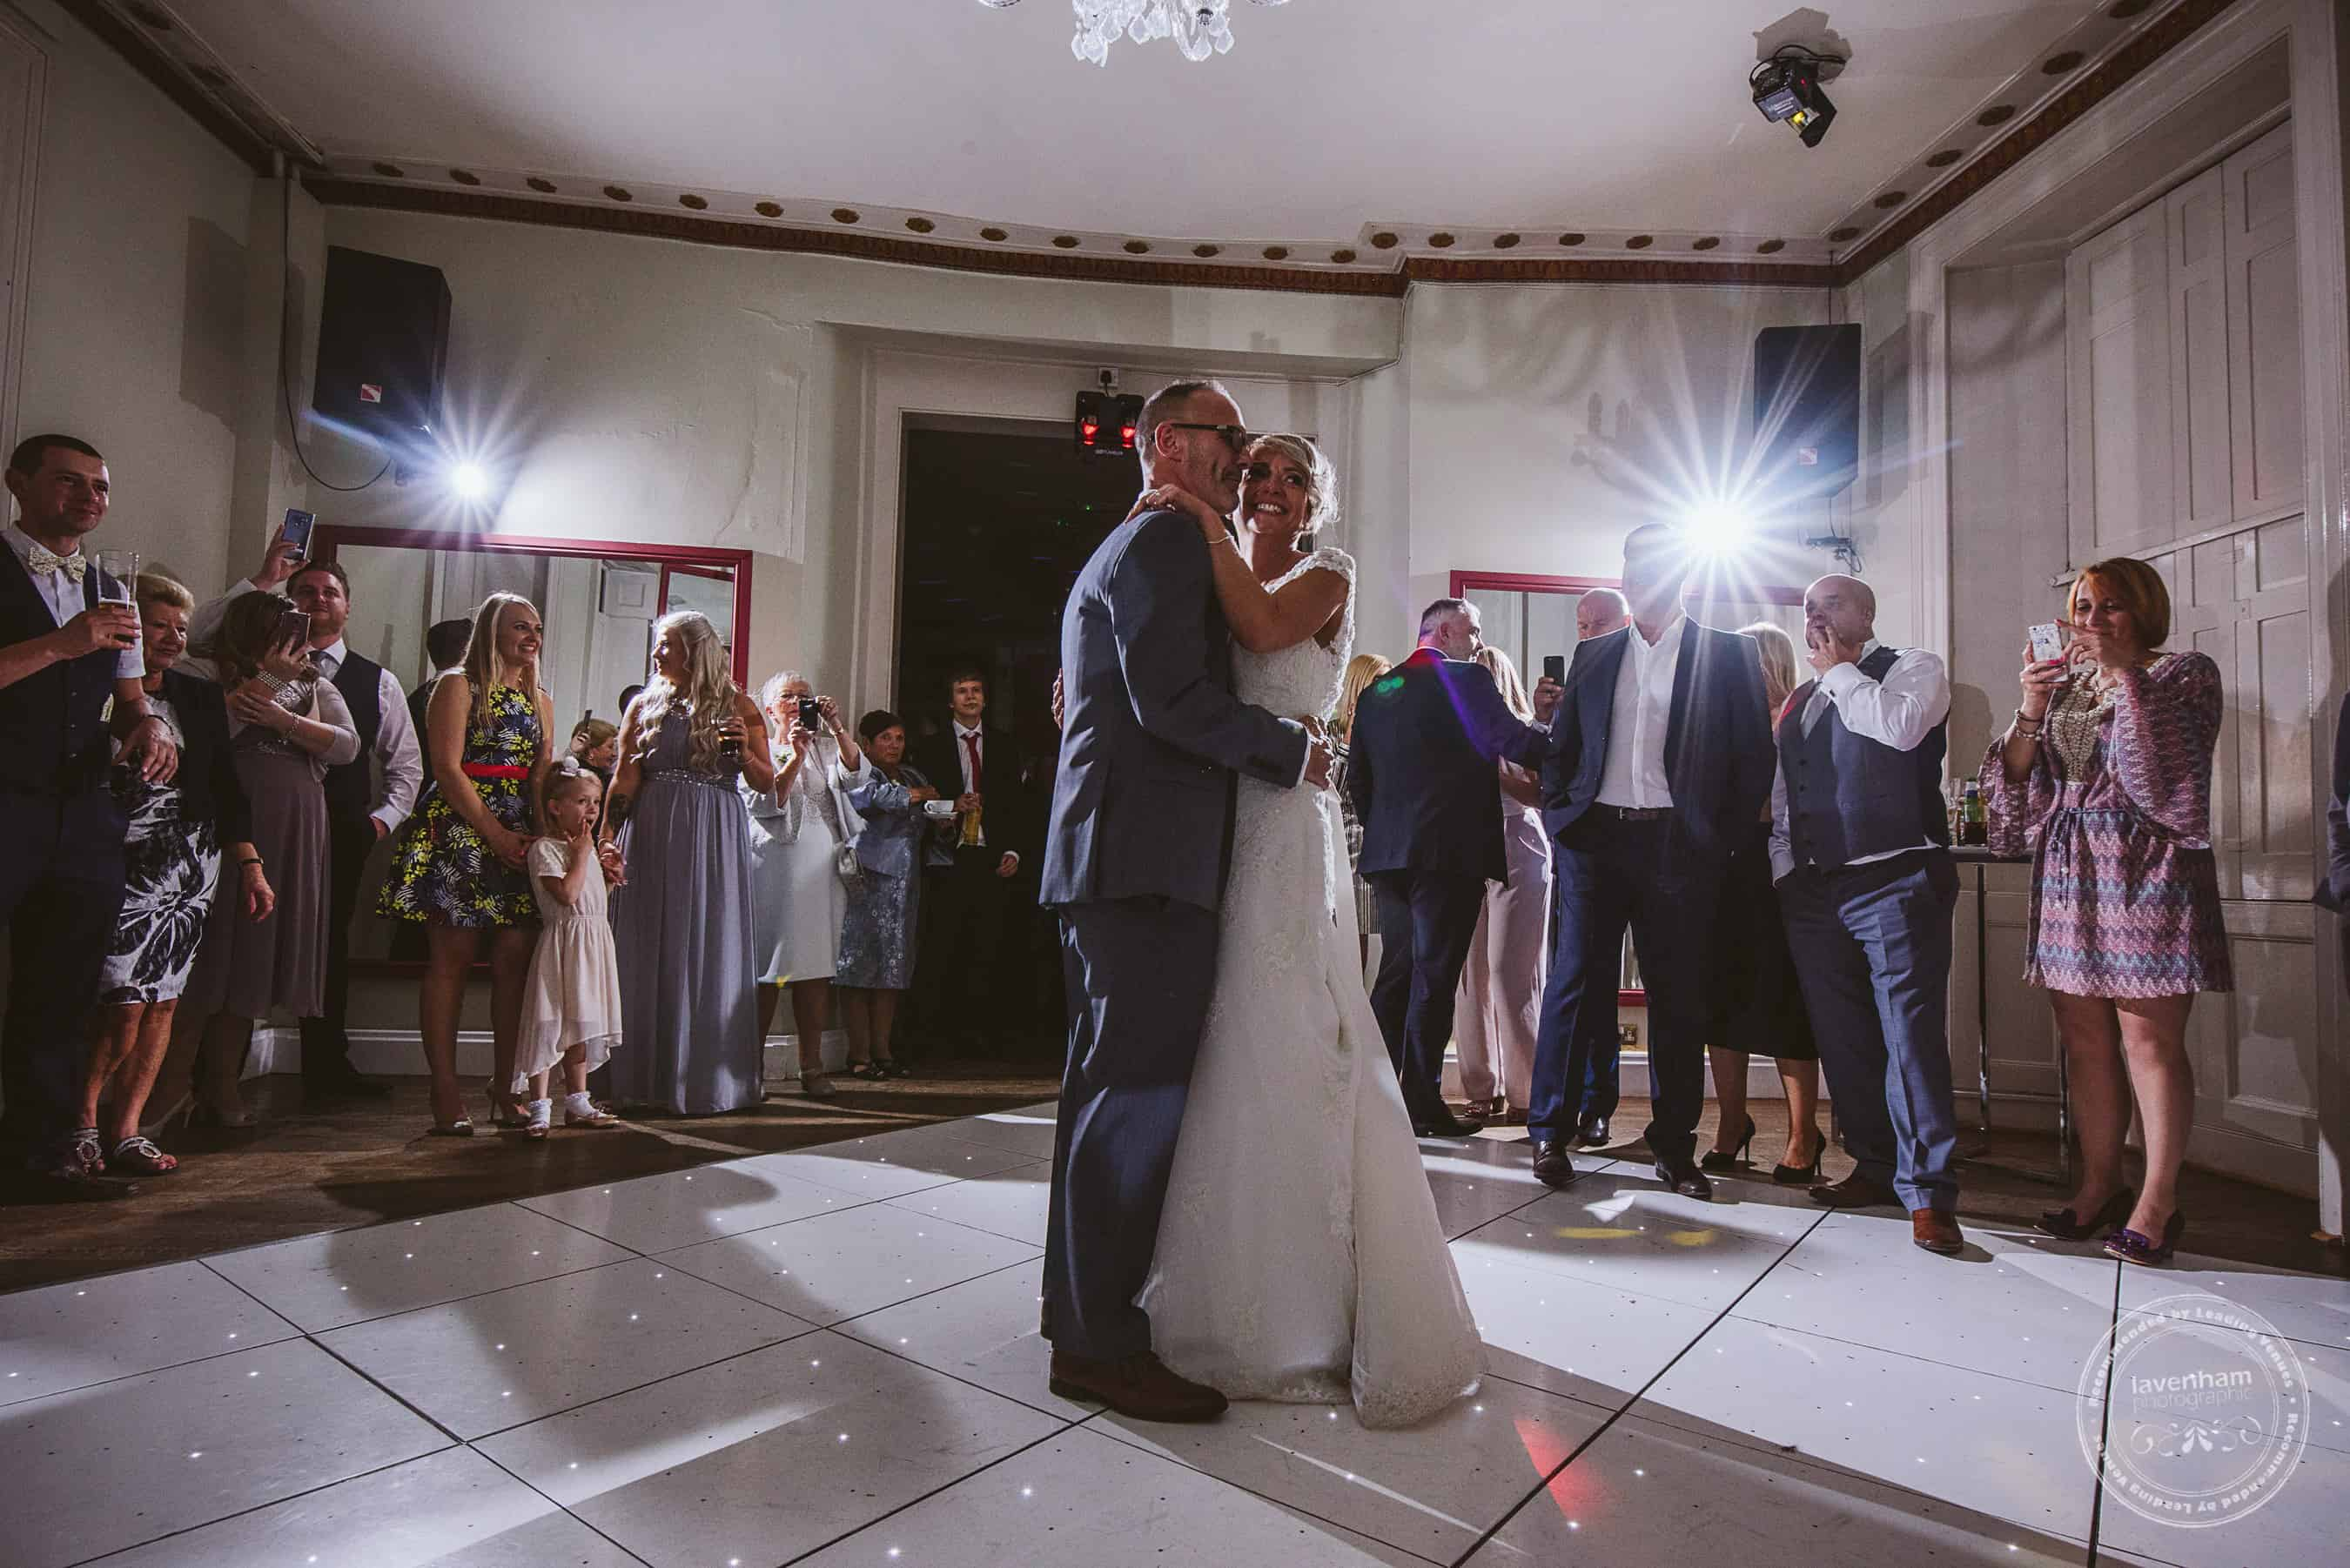 281018 Gosfield Hall Wedding Photography Lavenham Photographic 114